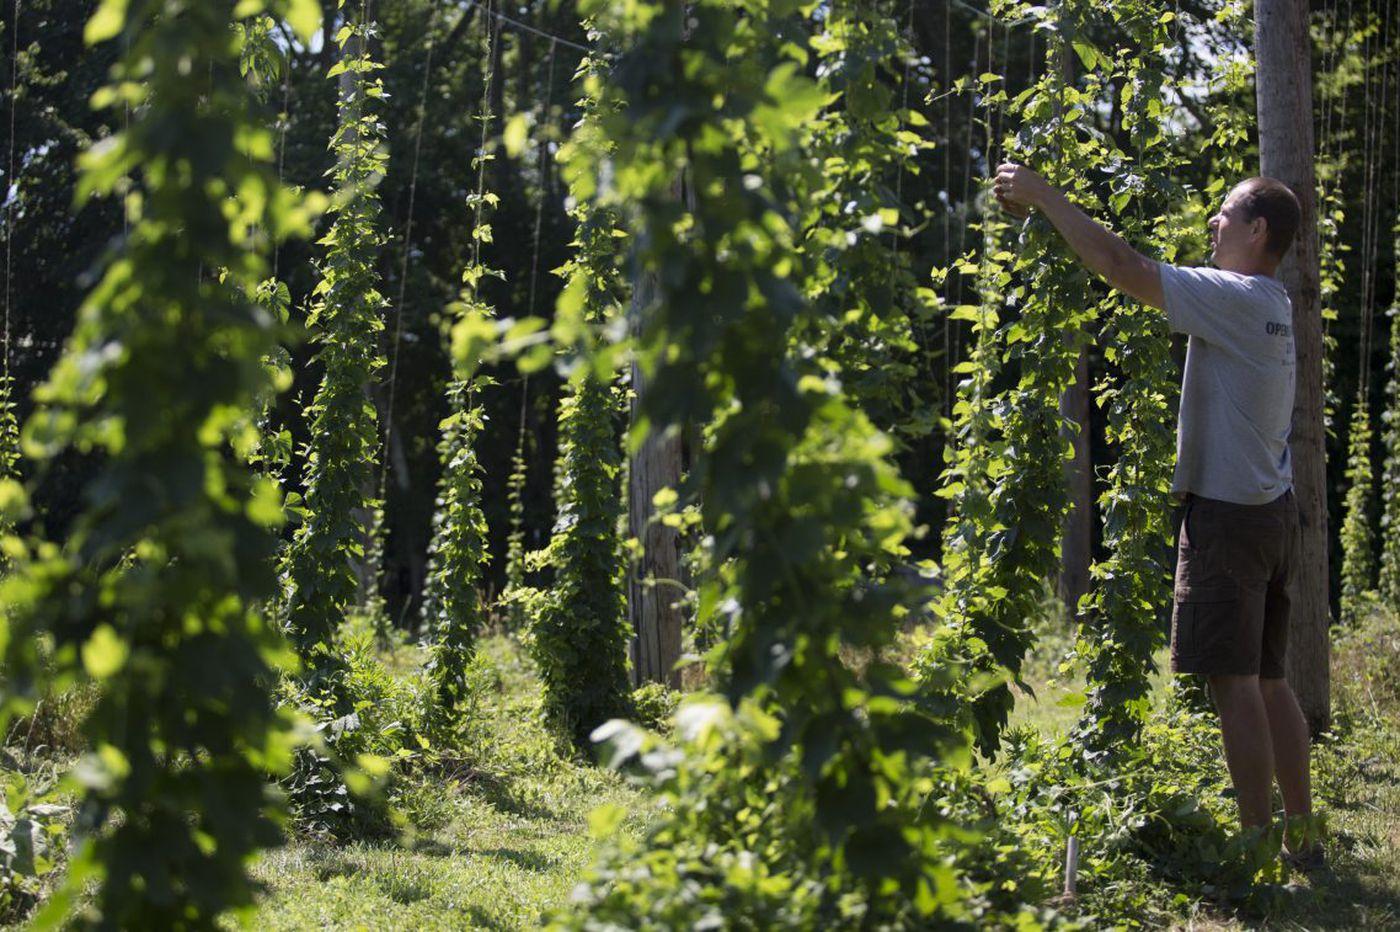 N.J. hops growers jump into trendy 'farm-to-mug' market